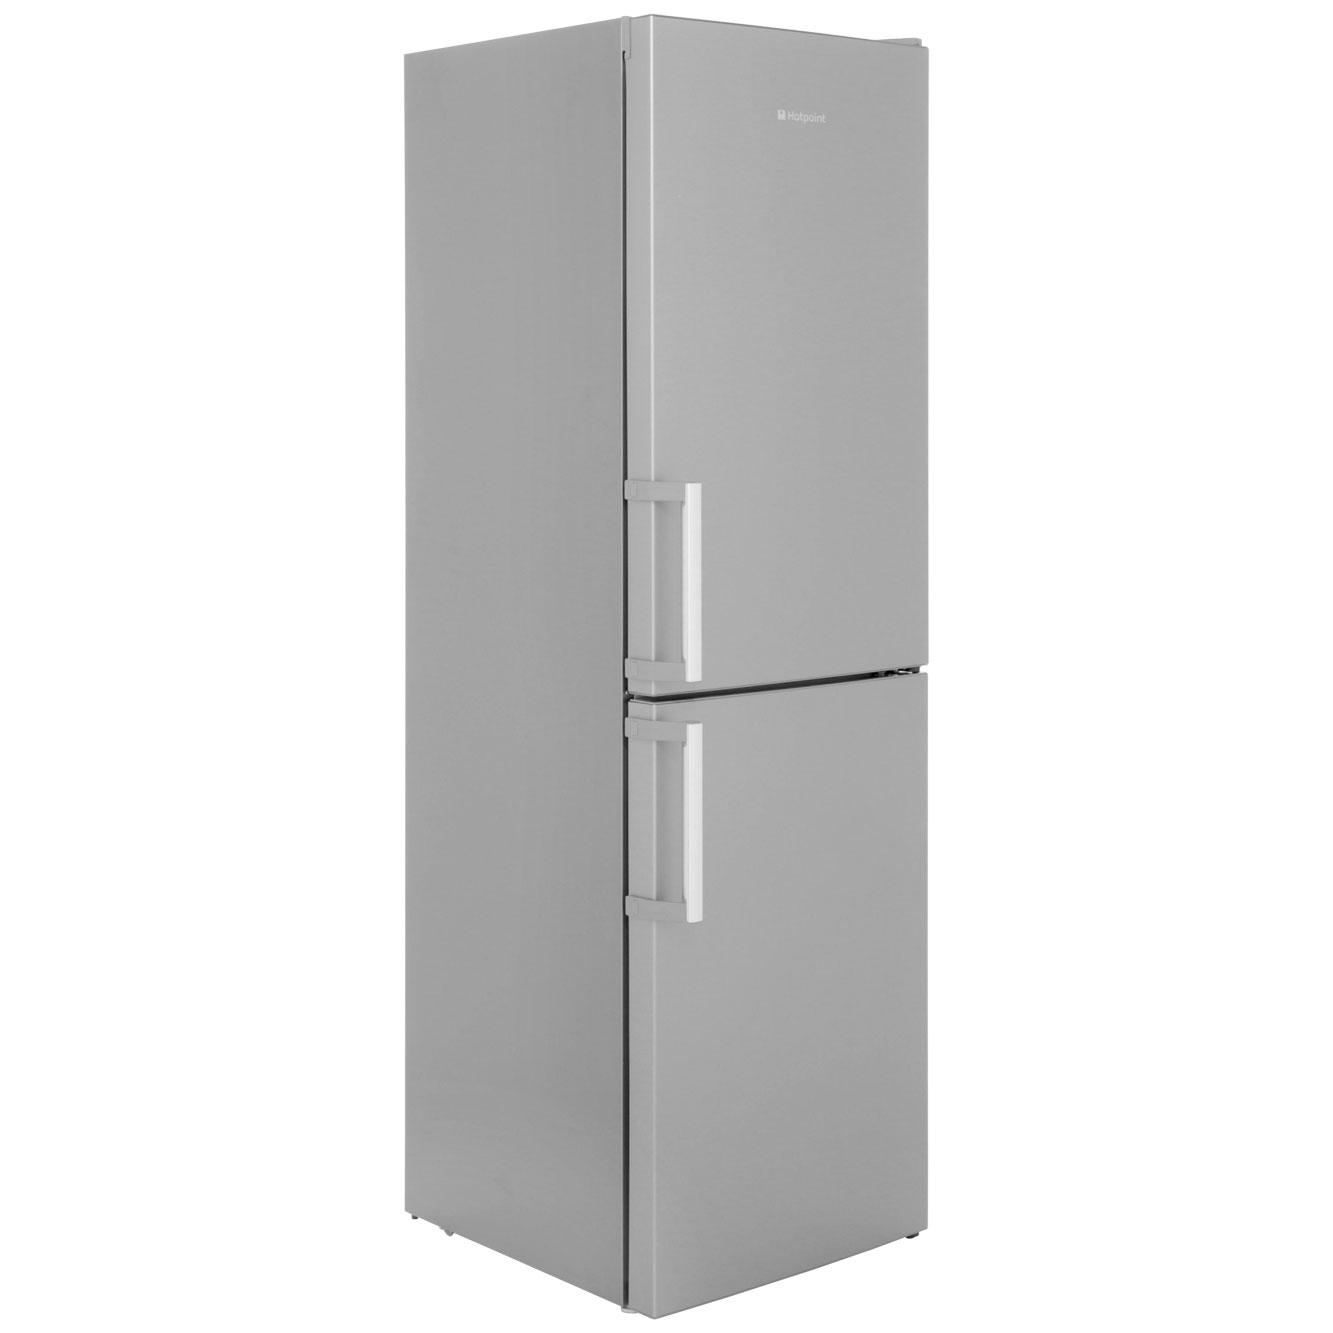 Hotpoint XAO95T2UGOJH Free Standing Fridge Freezer Frost Free in Graphite